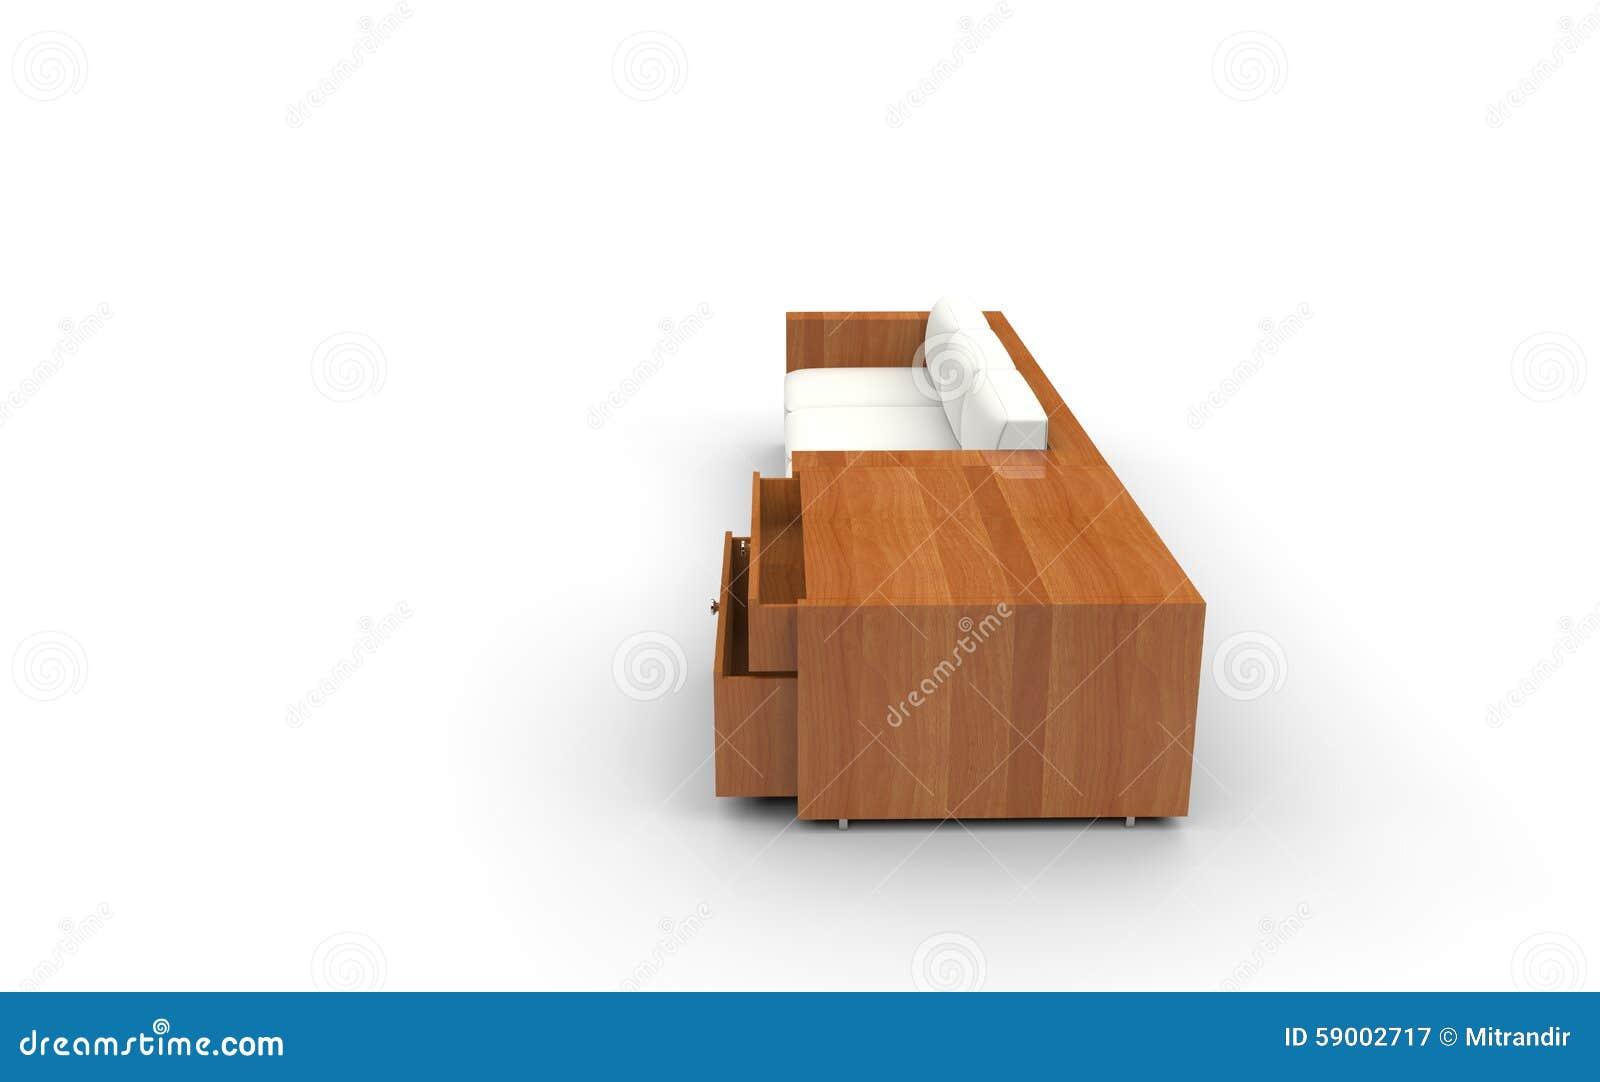 Деревянная софа